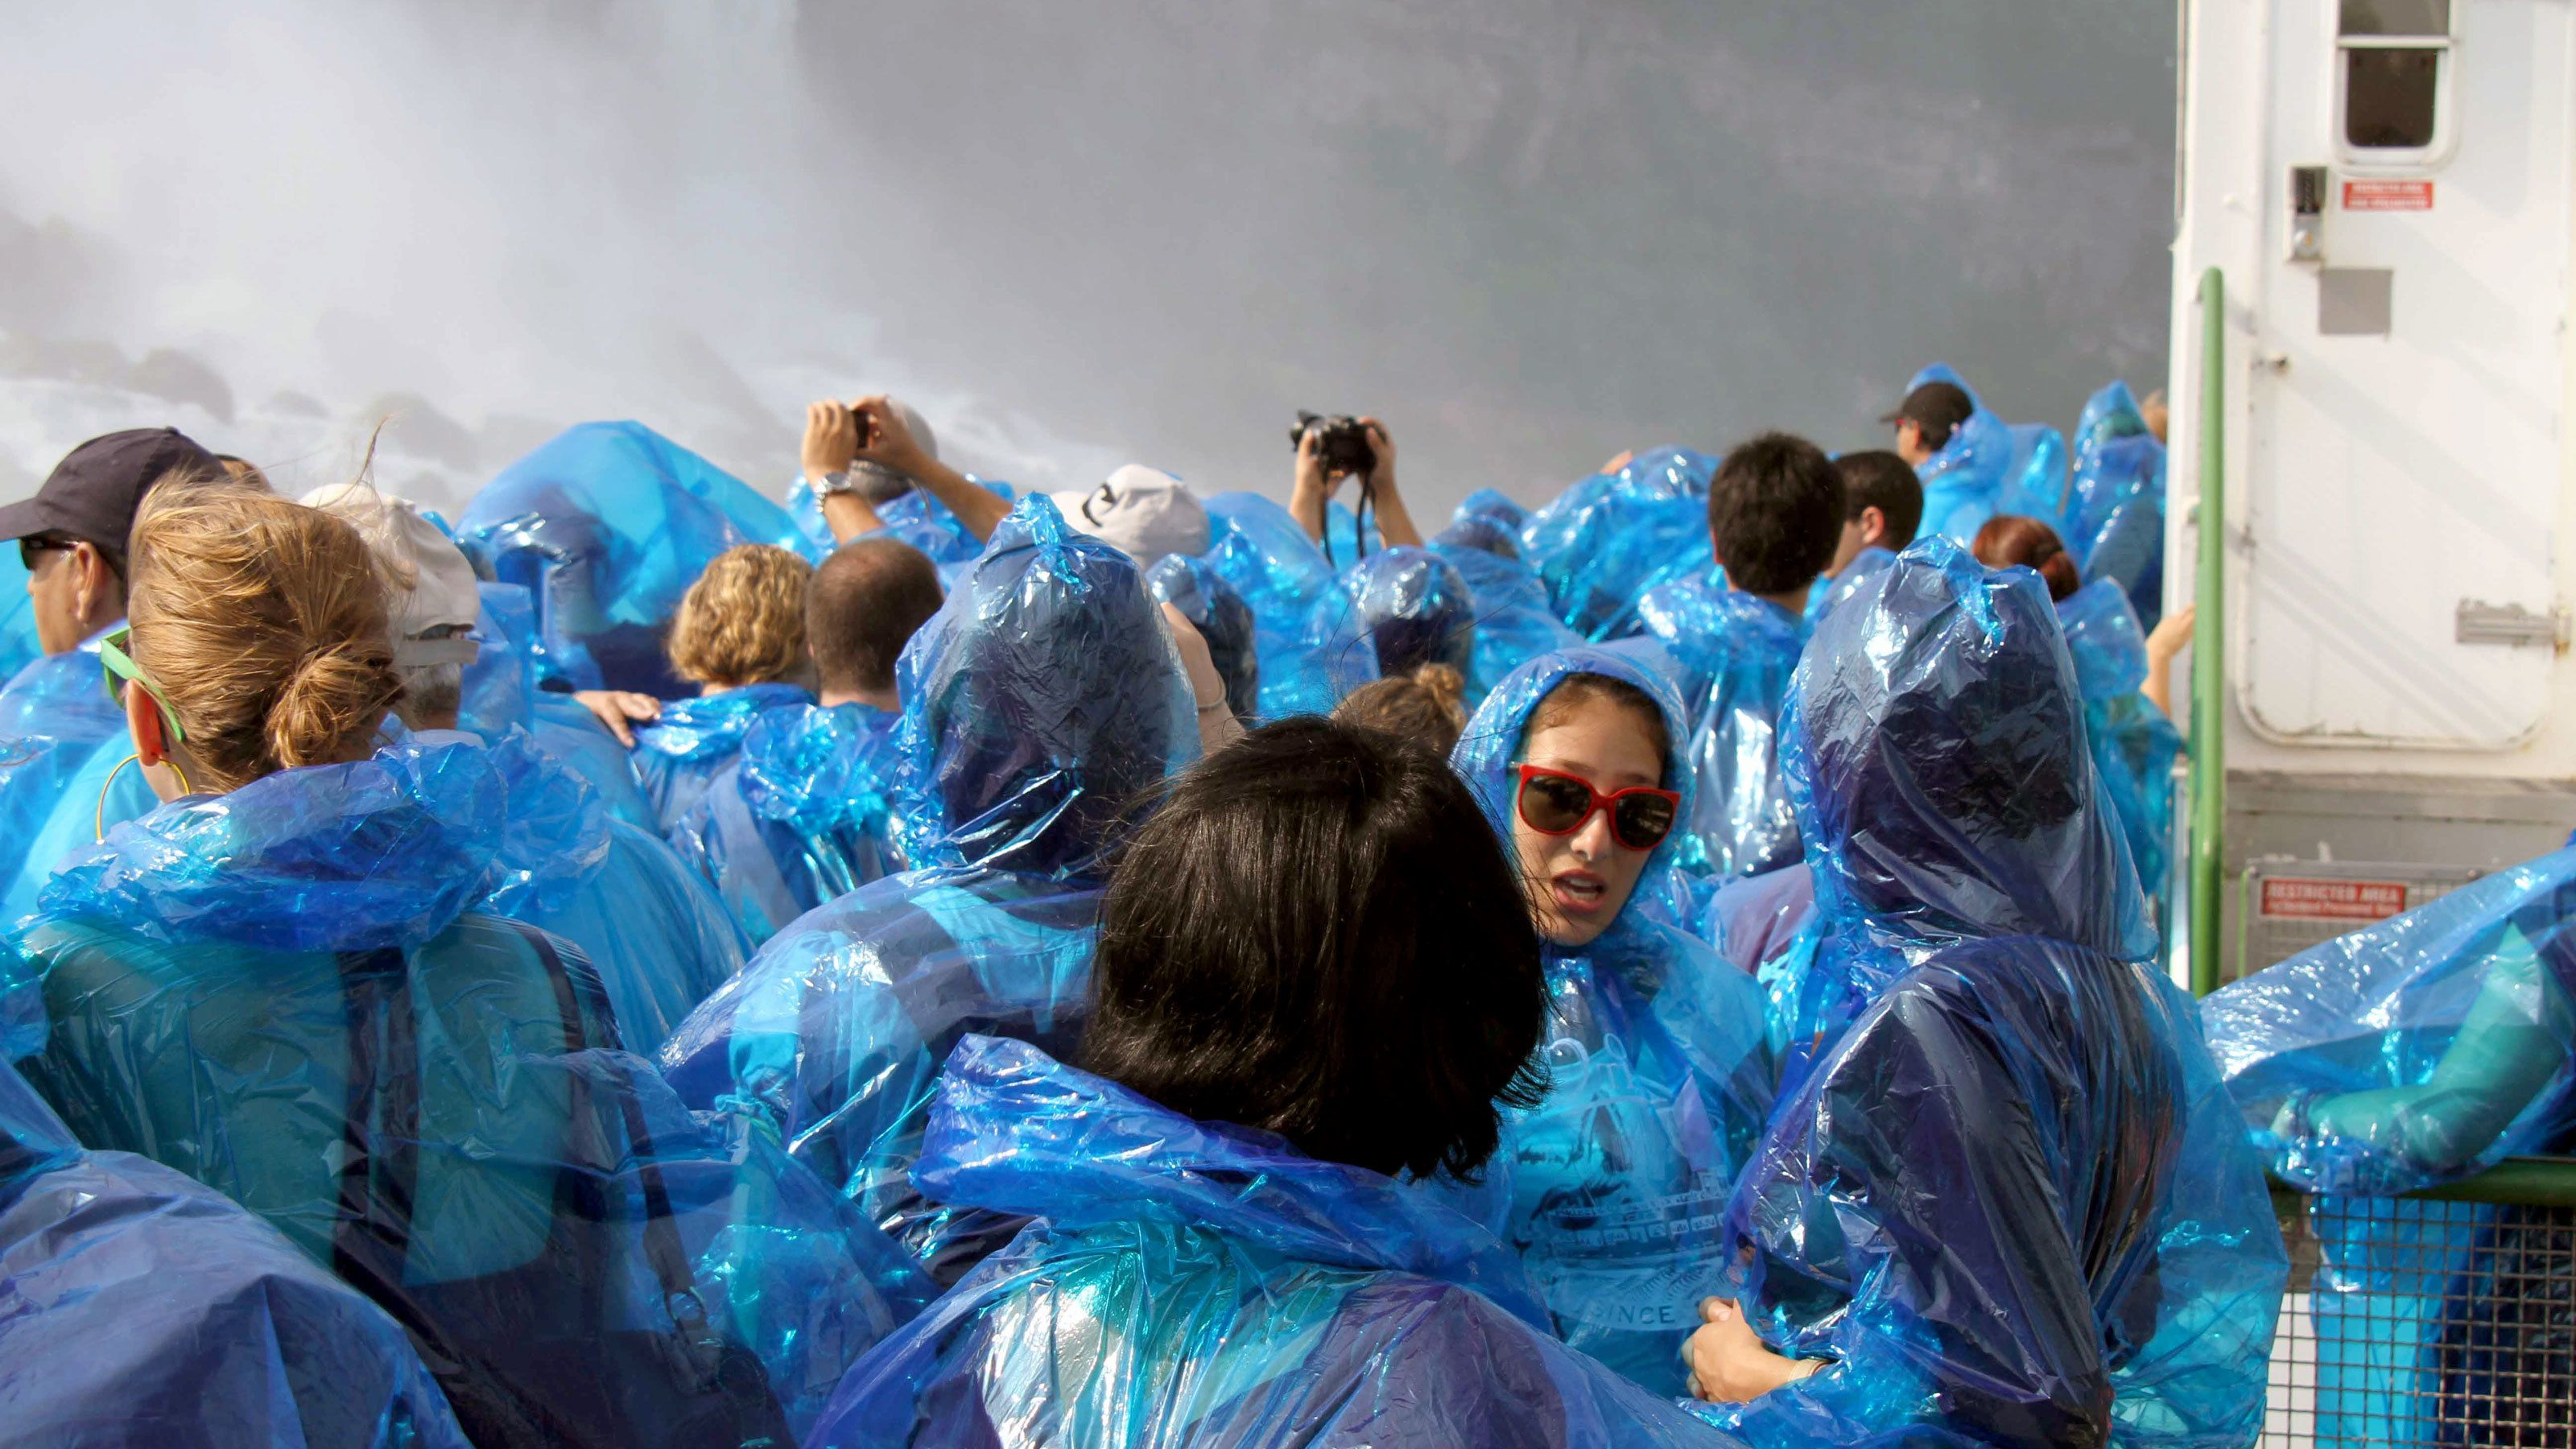 Niagara Falls tour group at an observation deck